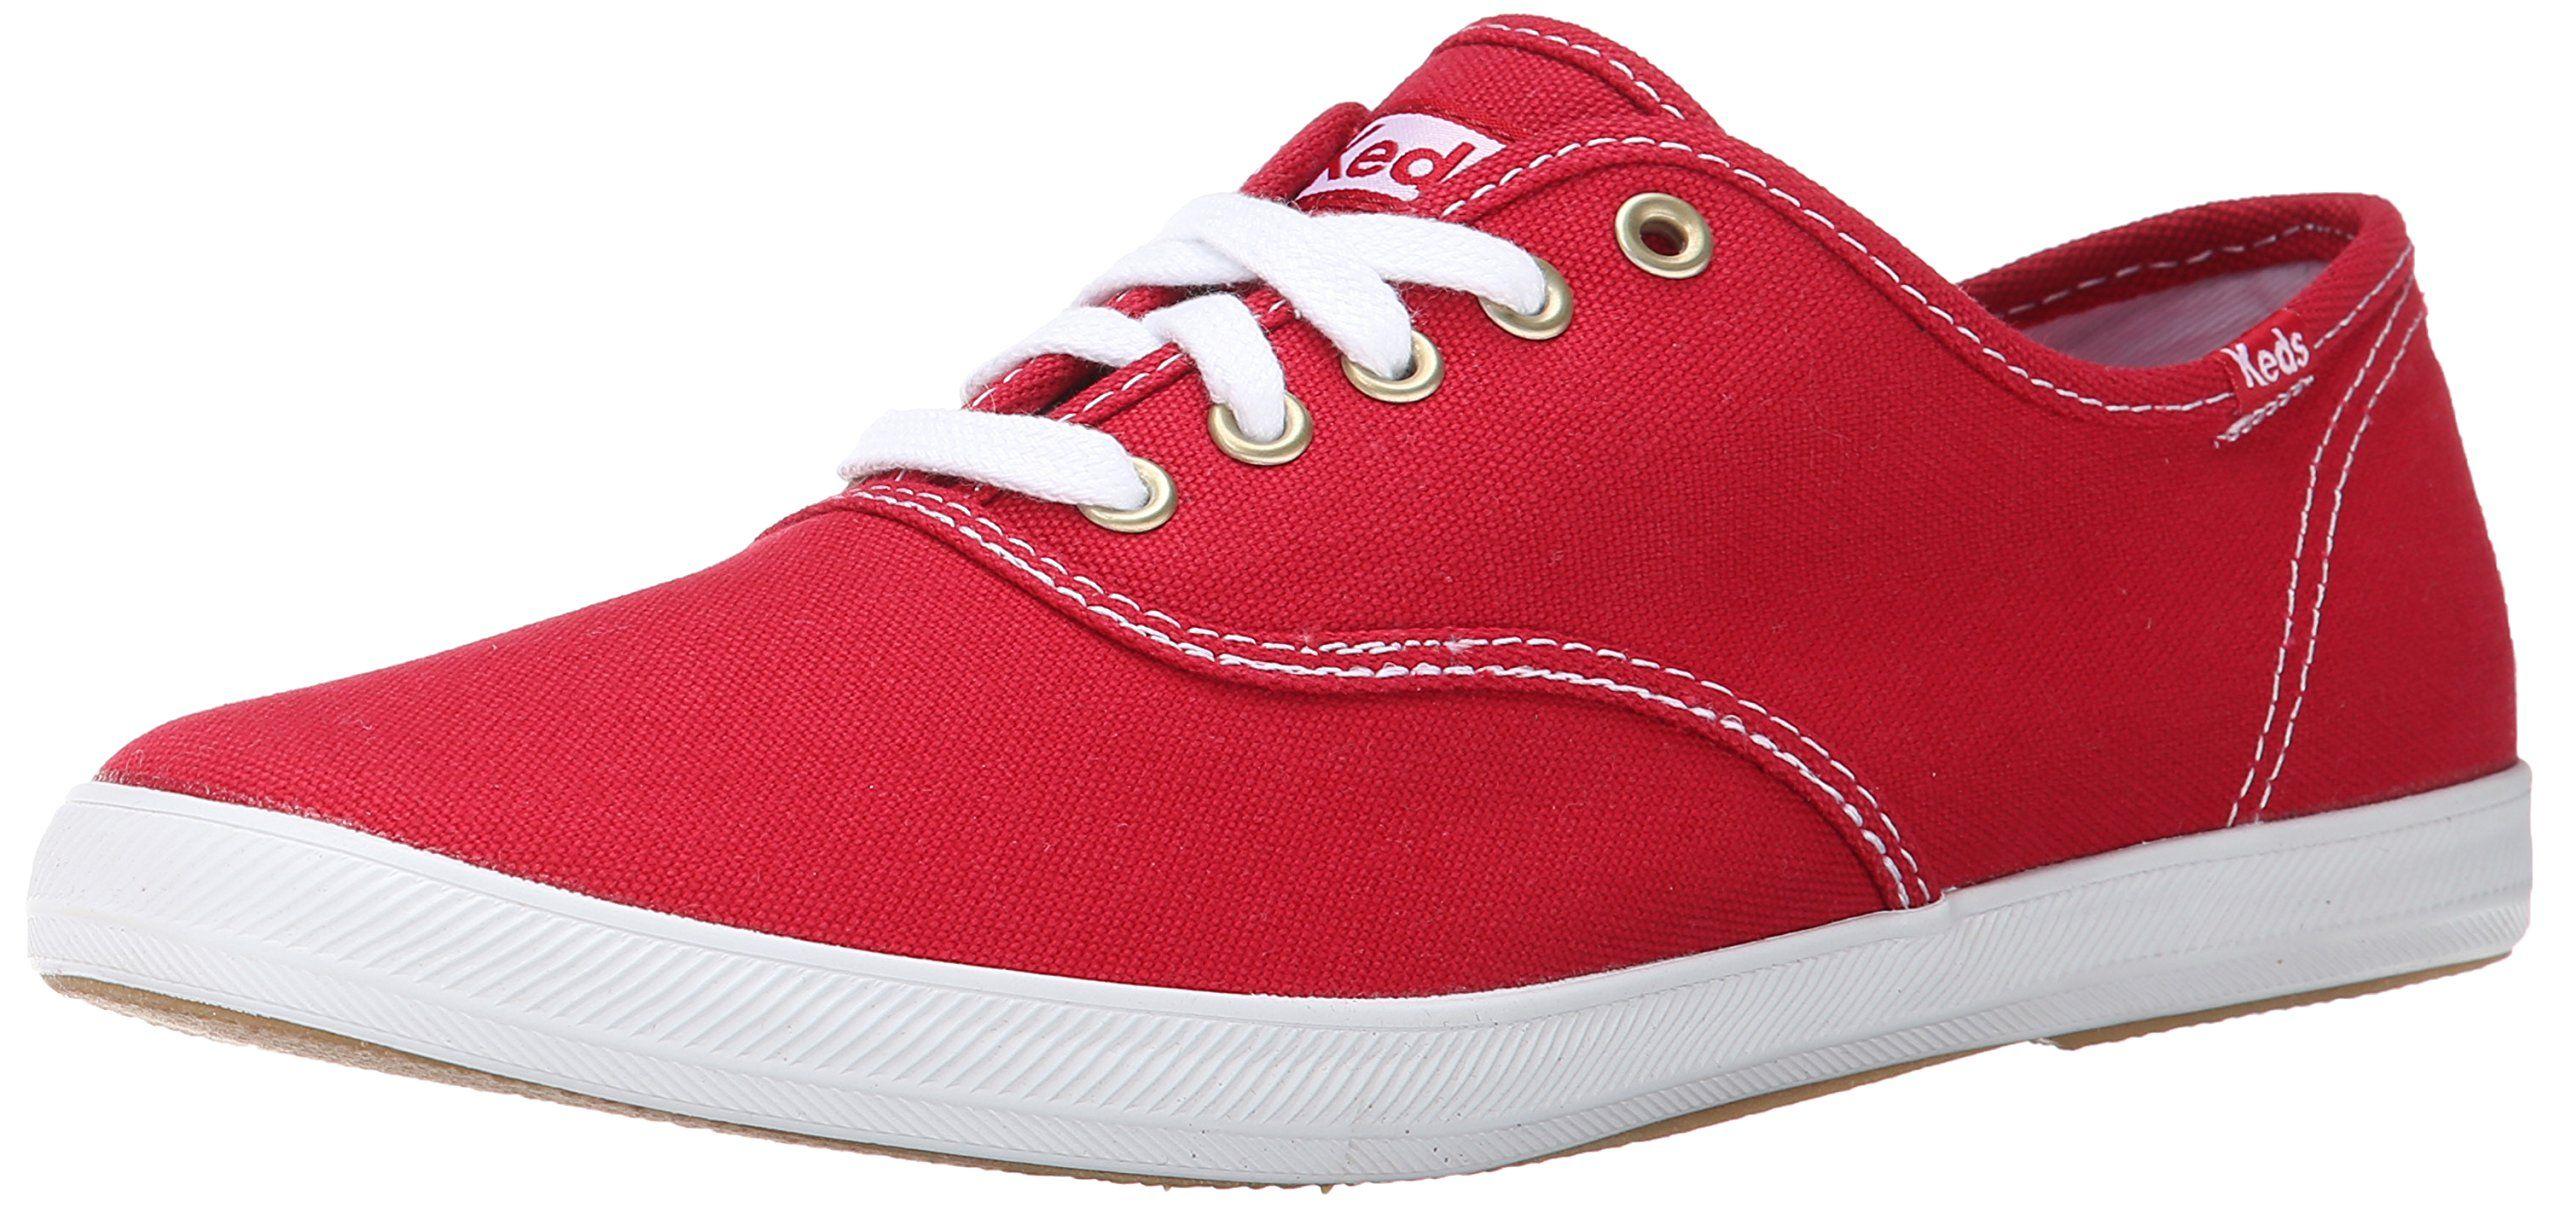 Keds Men's Champion Original Canvas Sneaker,Red,8 M US